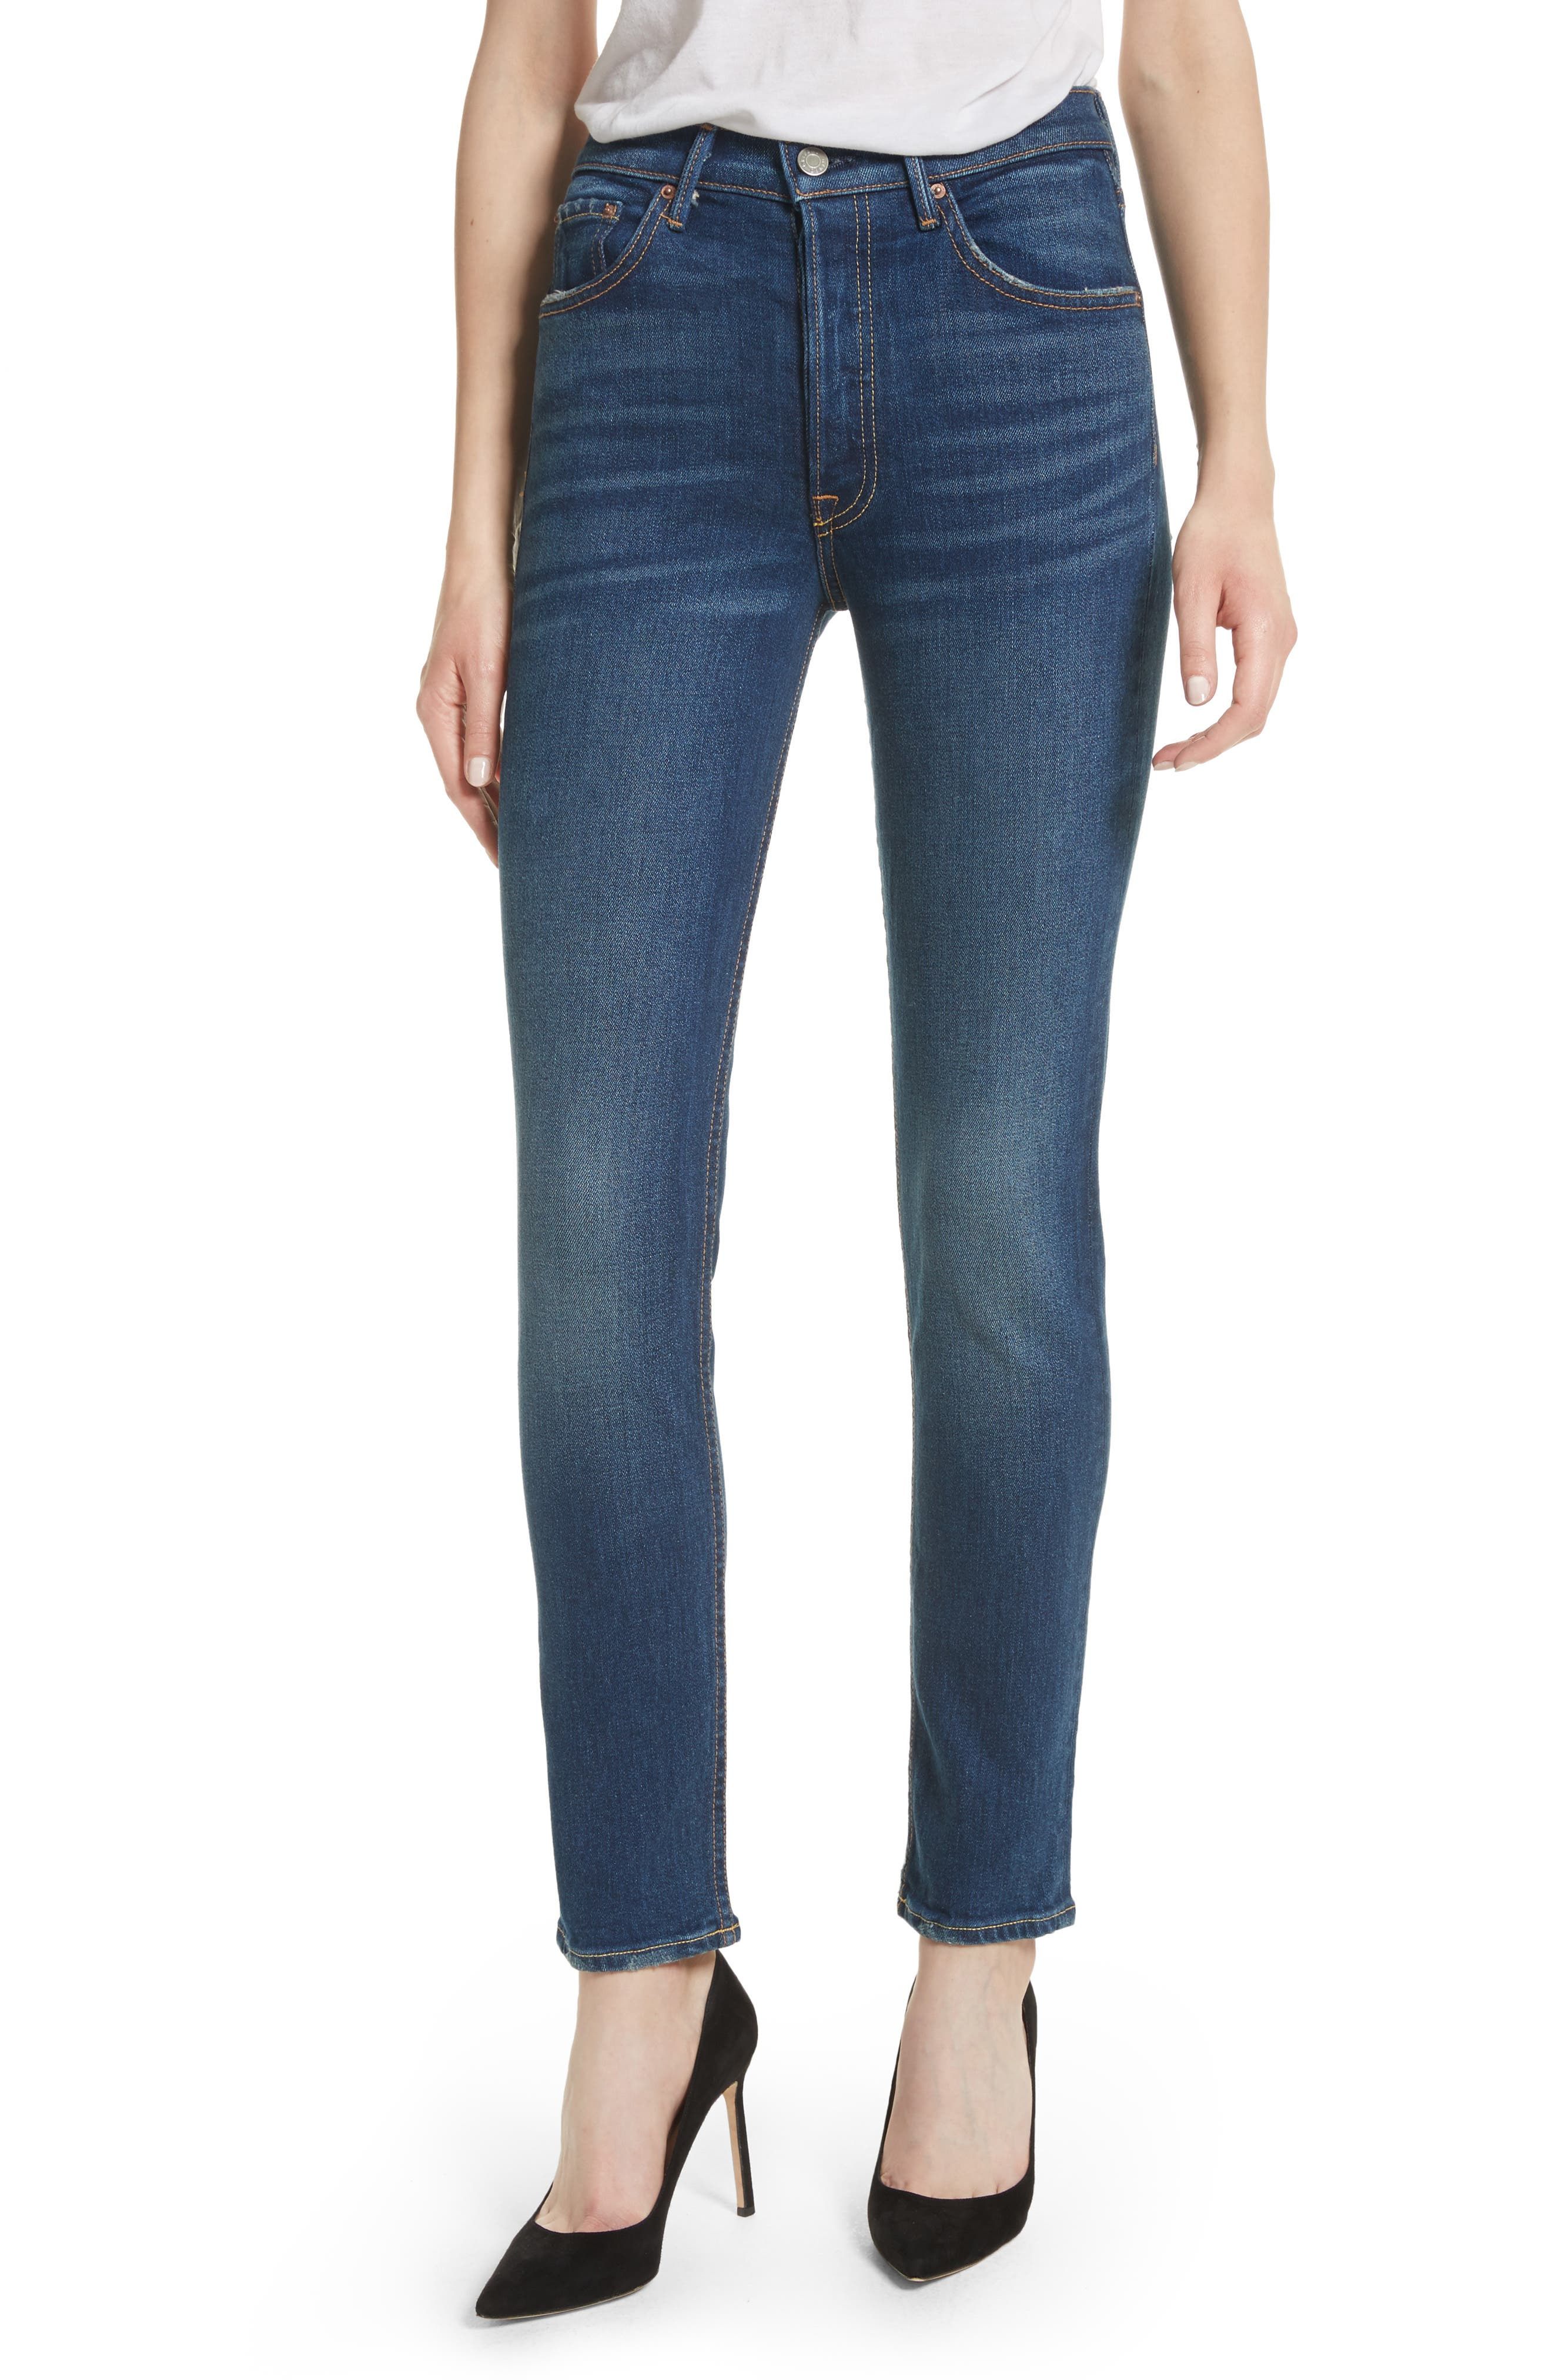 Karolina High Waist Skinny Jeans,                             Main thumbnail 1, color,                             Joan Jett